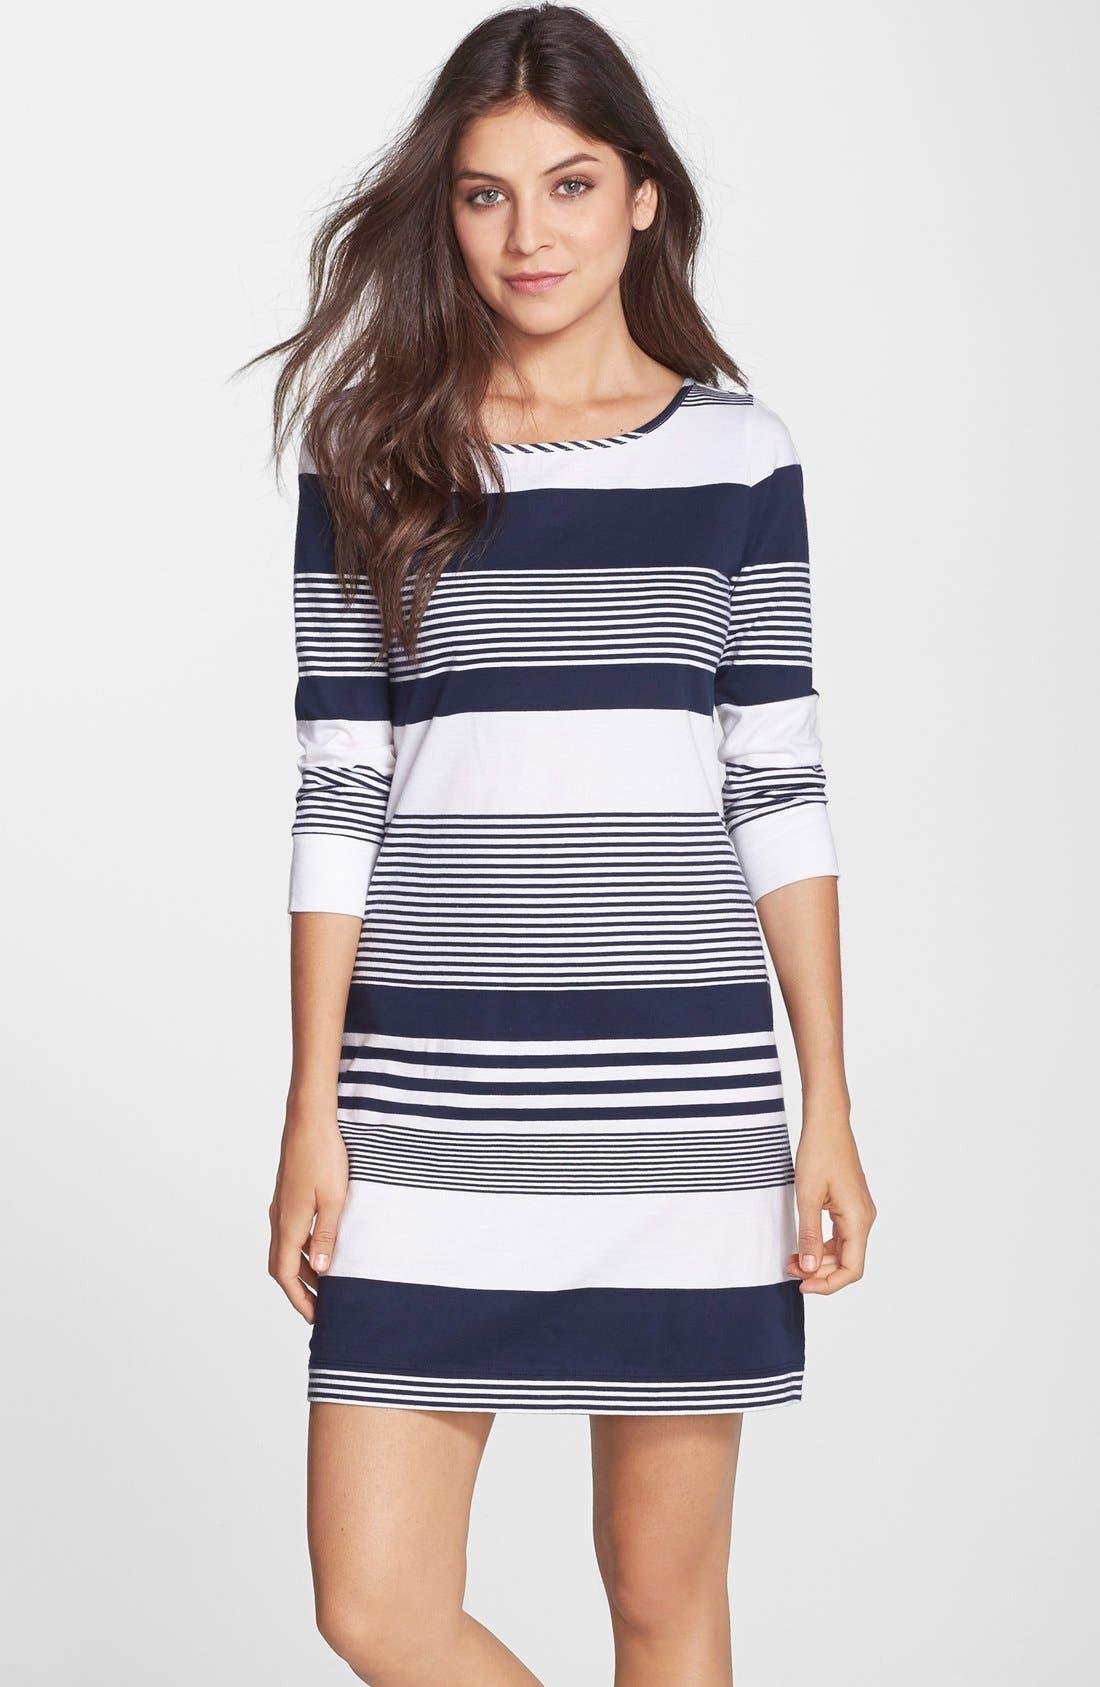 Alternate Image 1 Selected - Lilly Pulitzer® Marlowe Stripe Pima Cotton Shift Dress